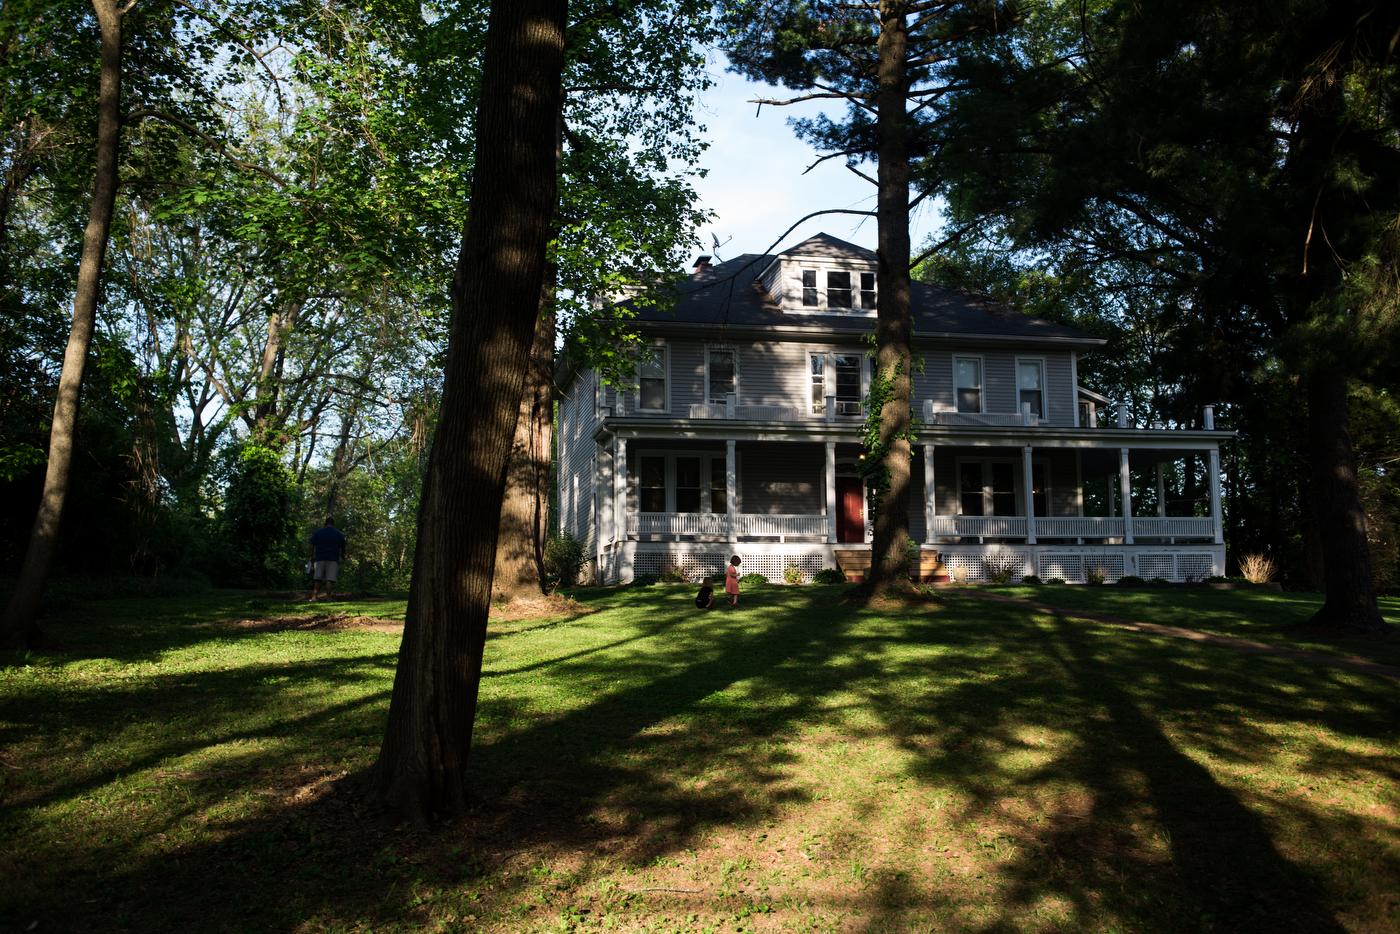 An historic house in the Old Ferguson West neighborhood.